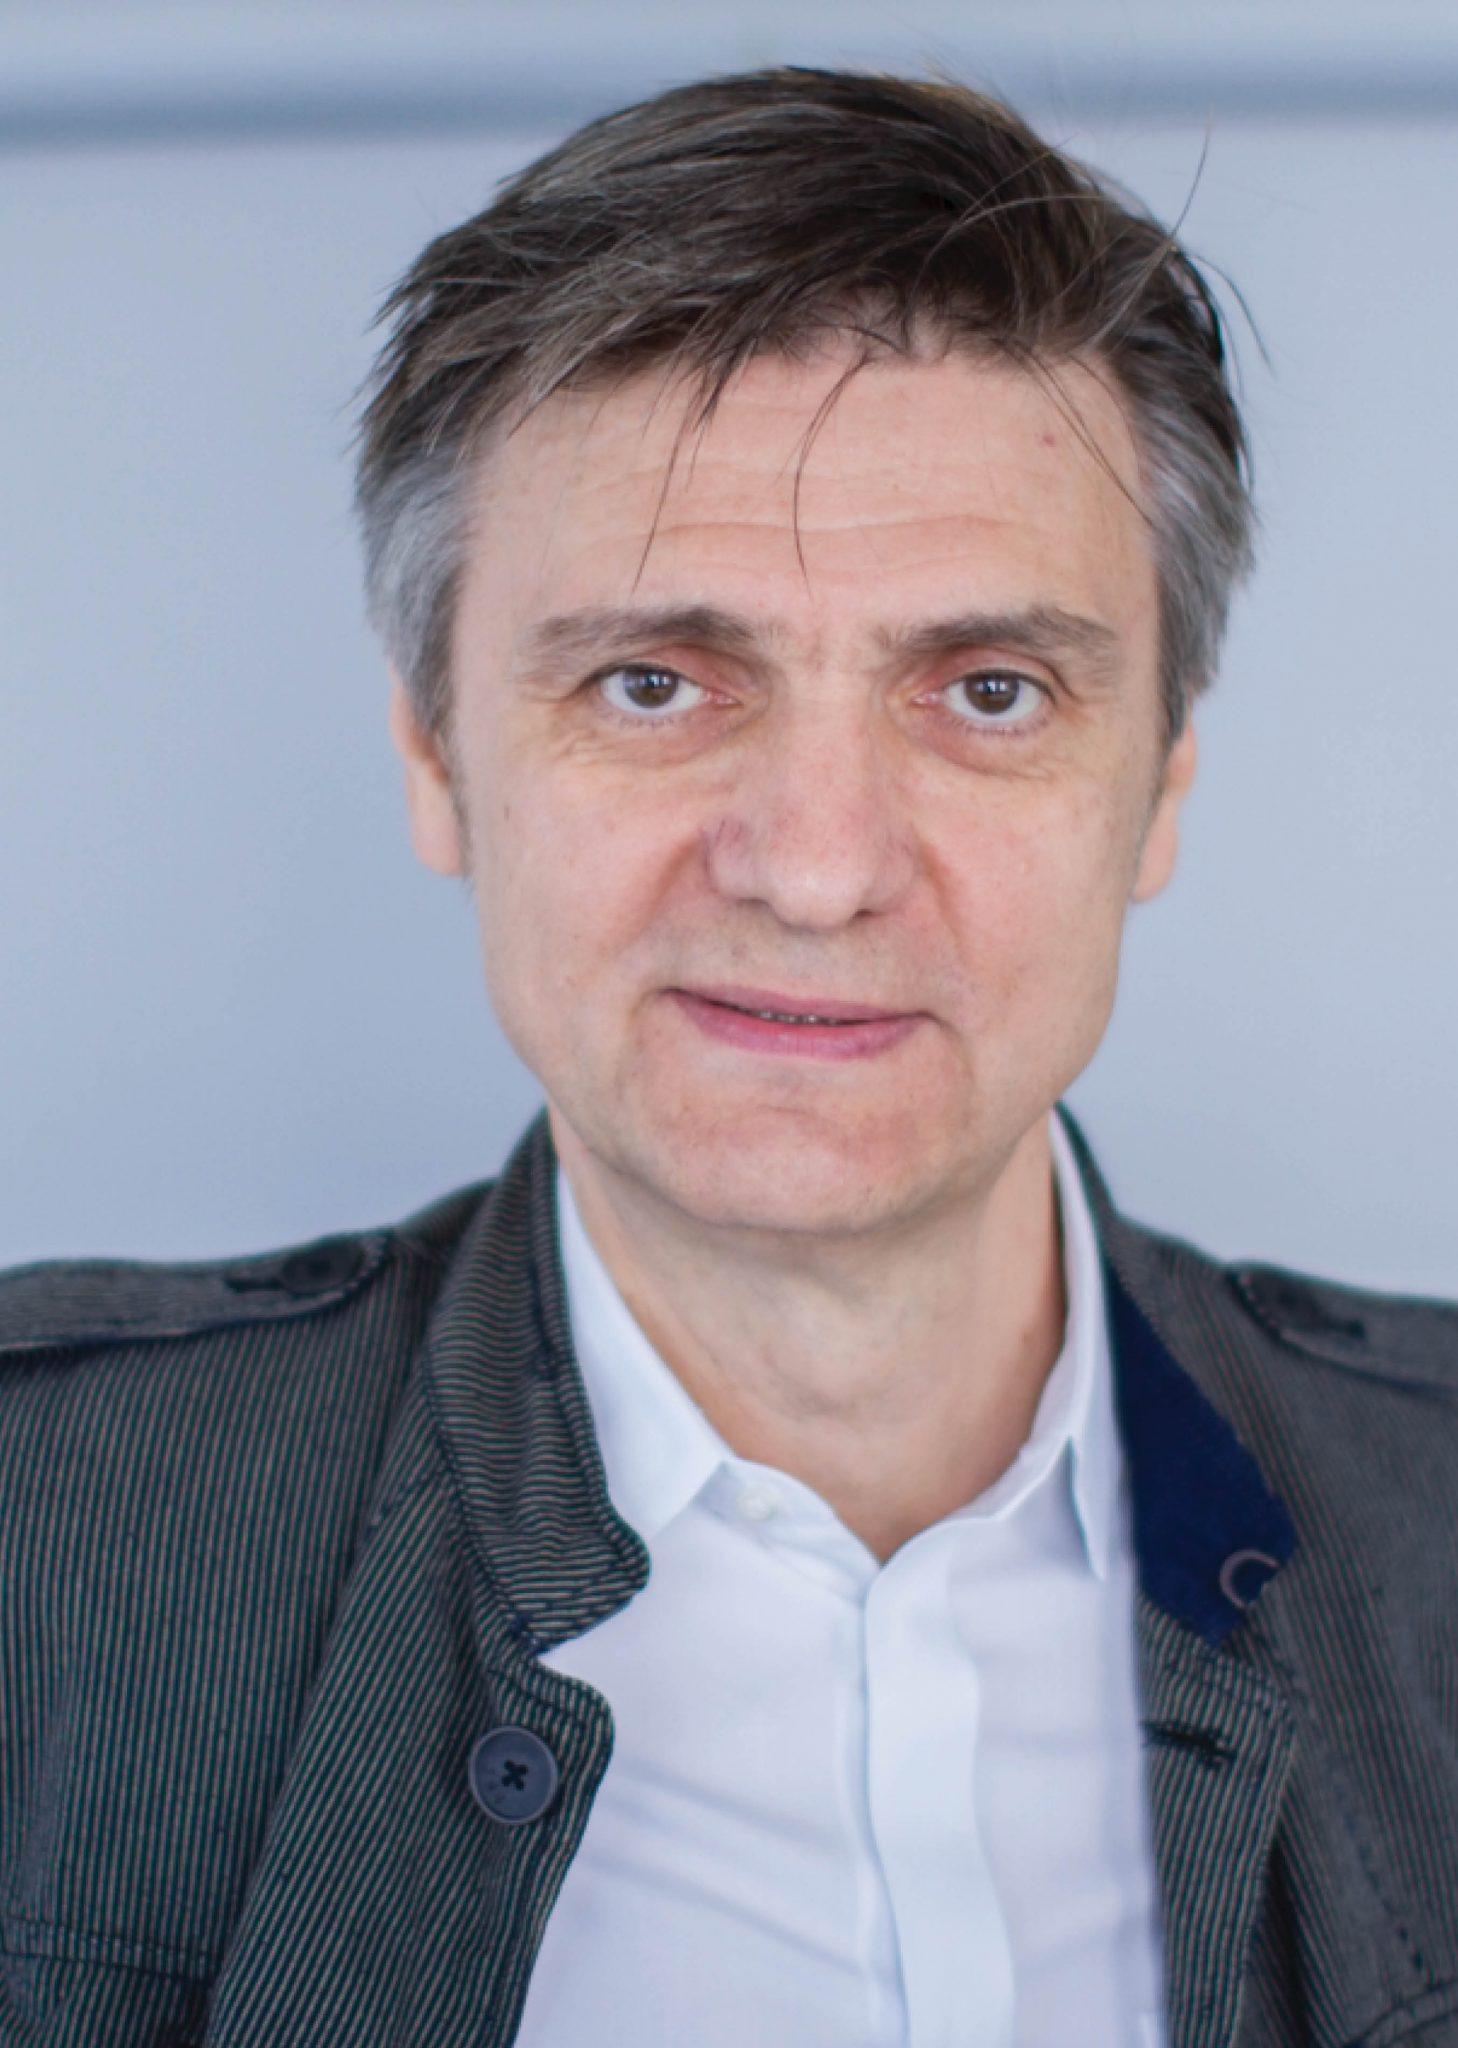 Marius Radulescu, AIA, Associate Principal photo